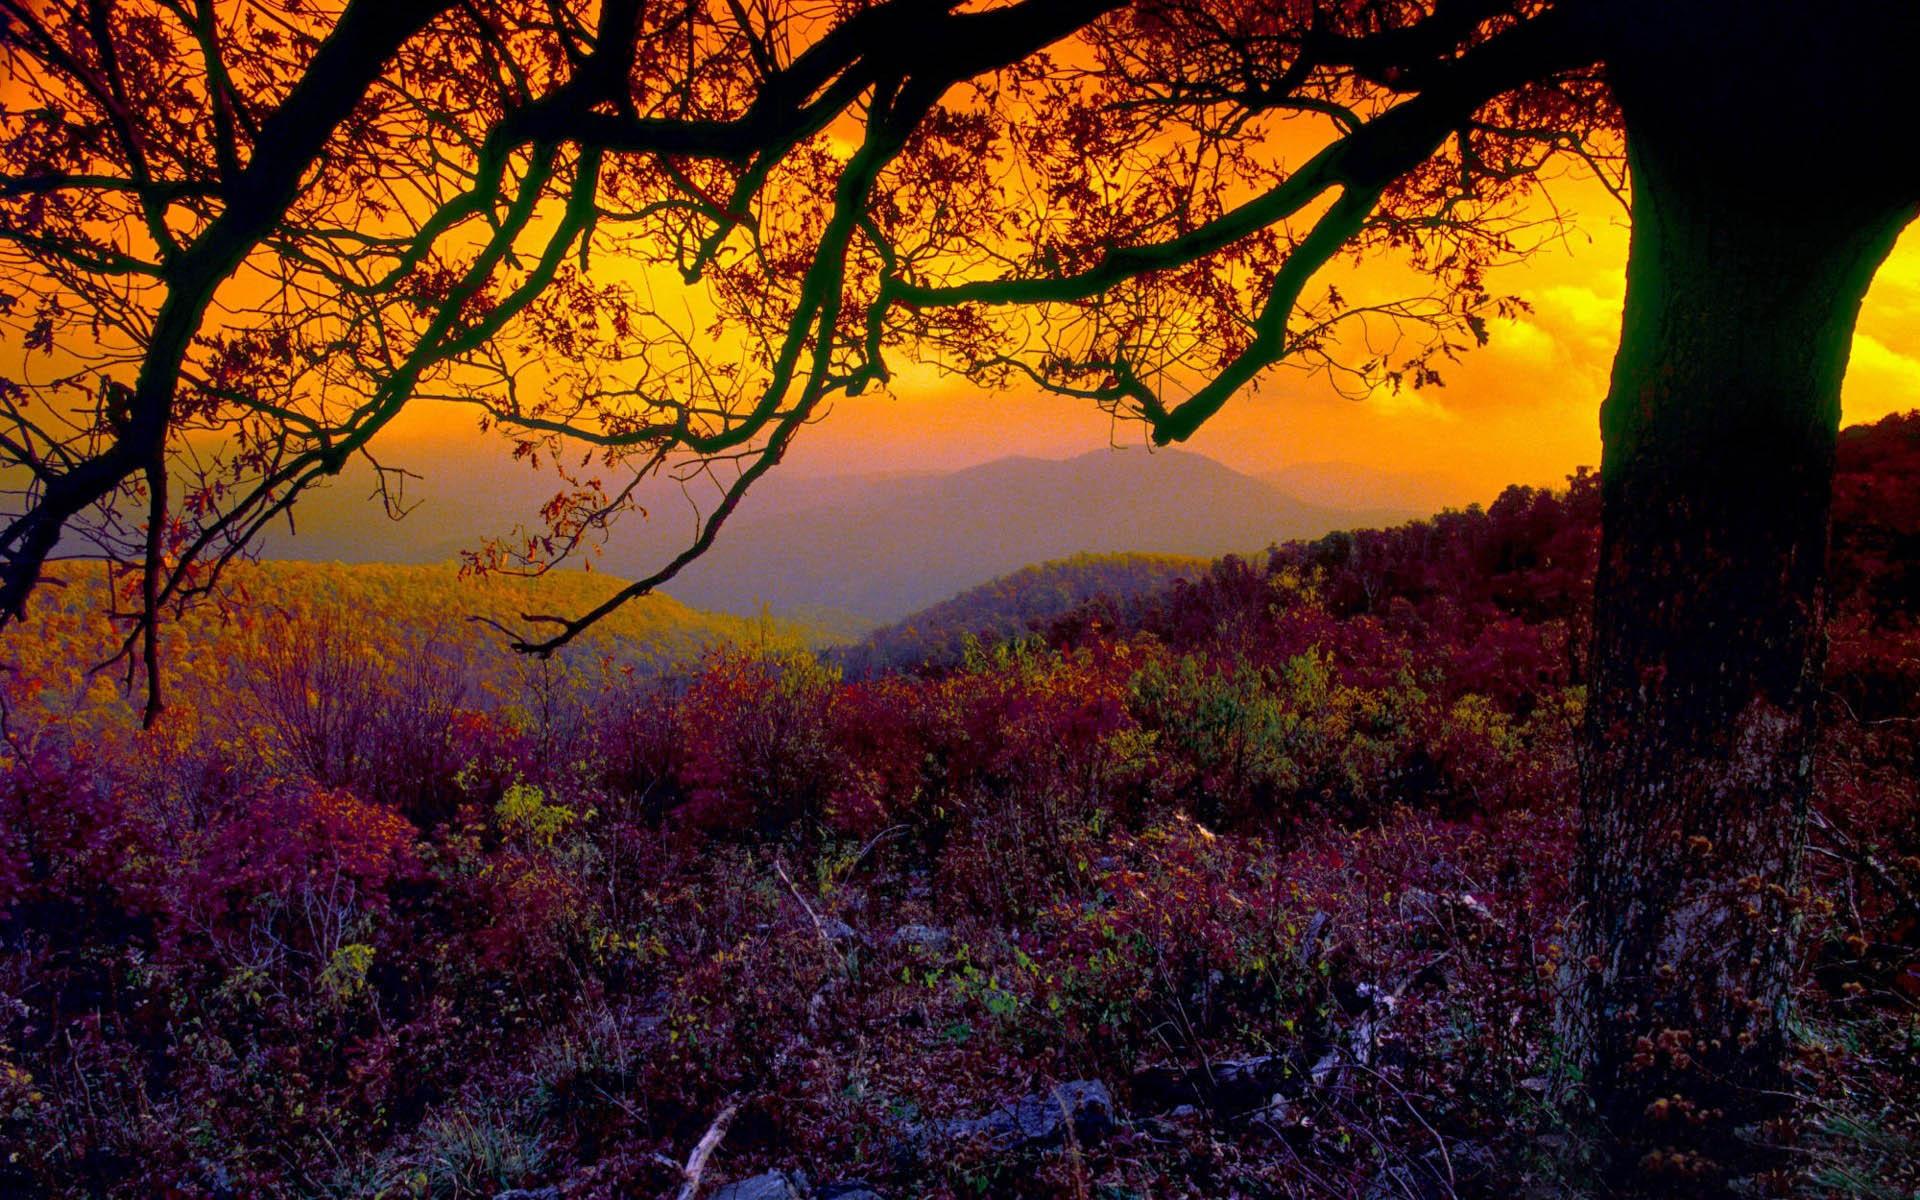 Autumn Images Backgrounds - WallpaperPulse